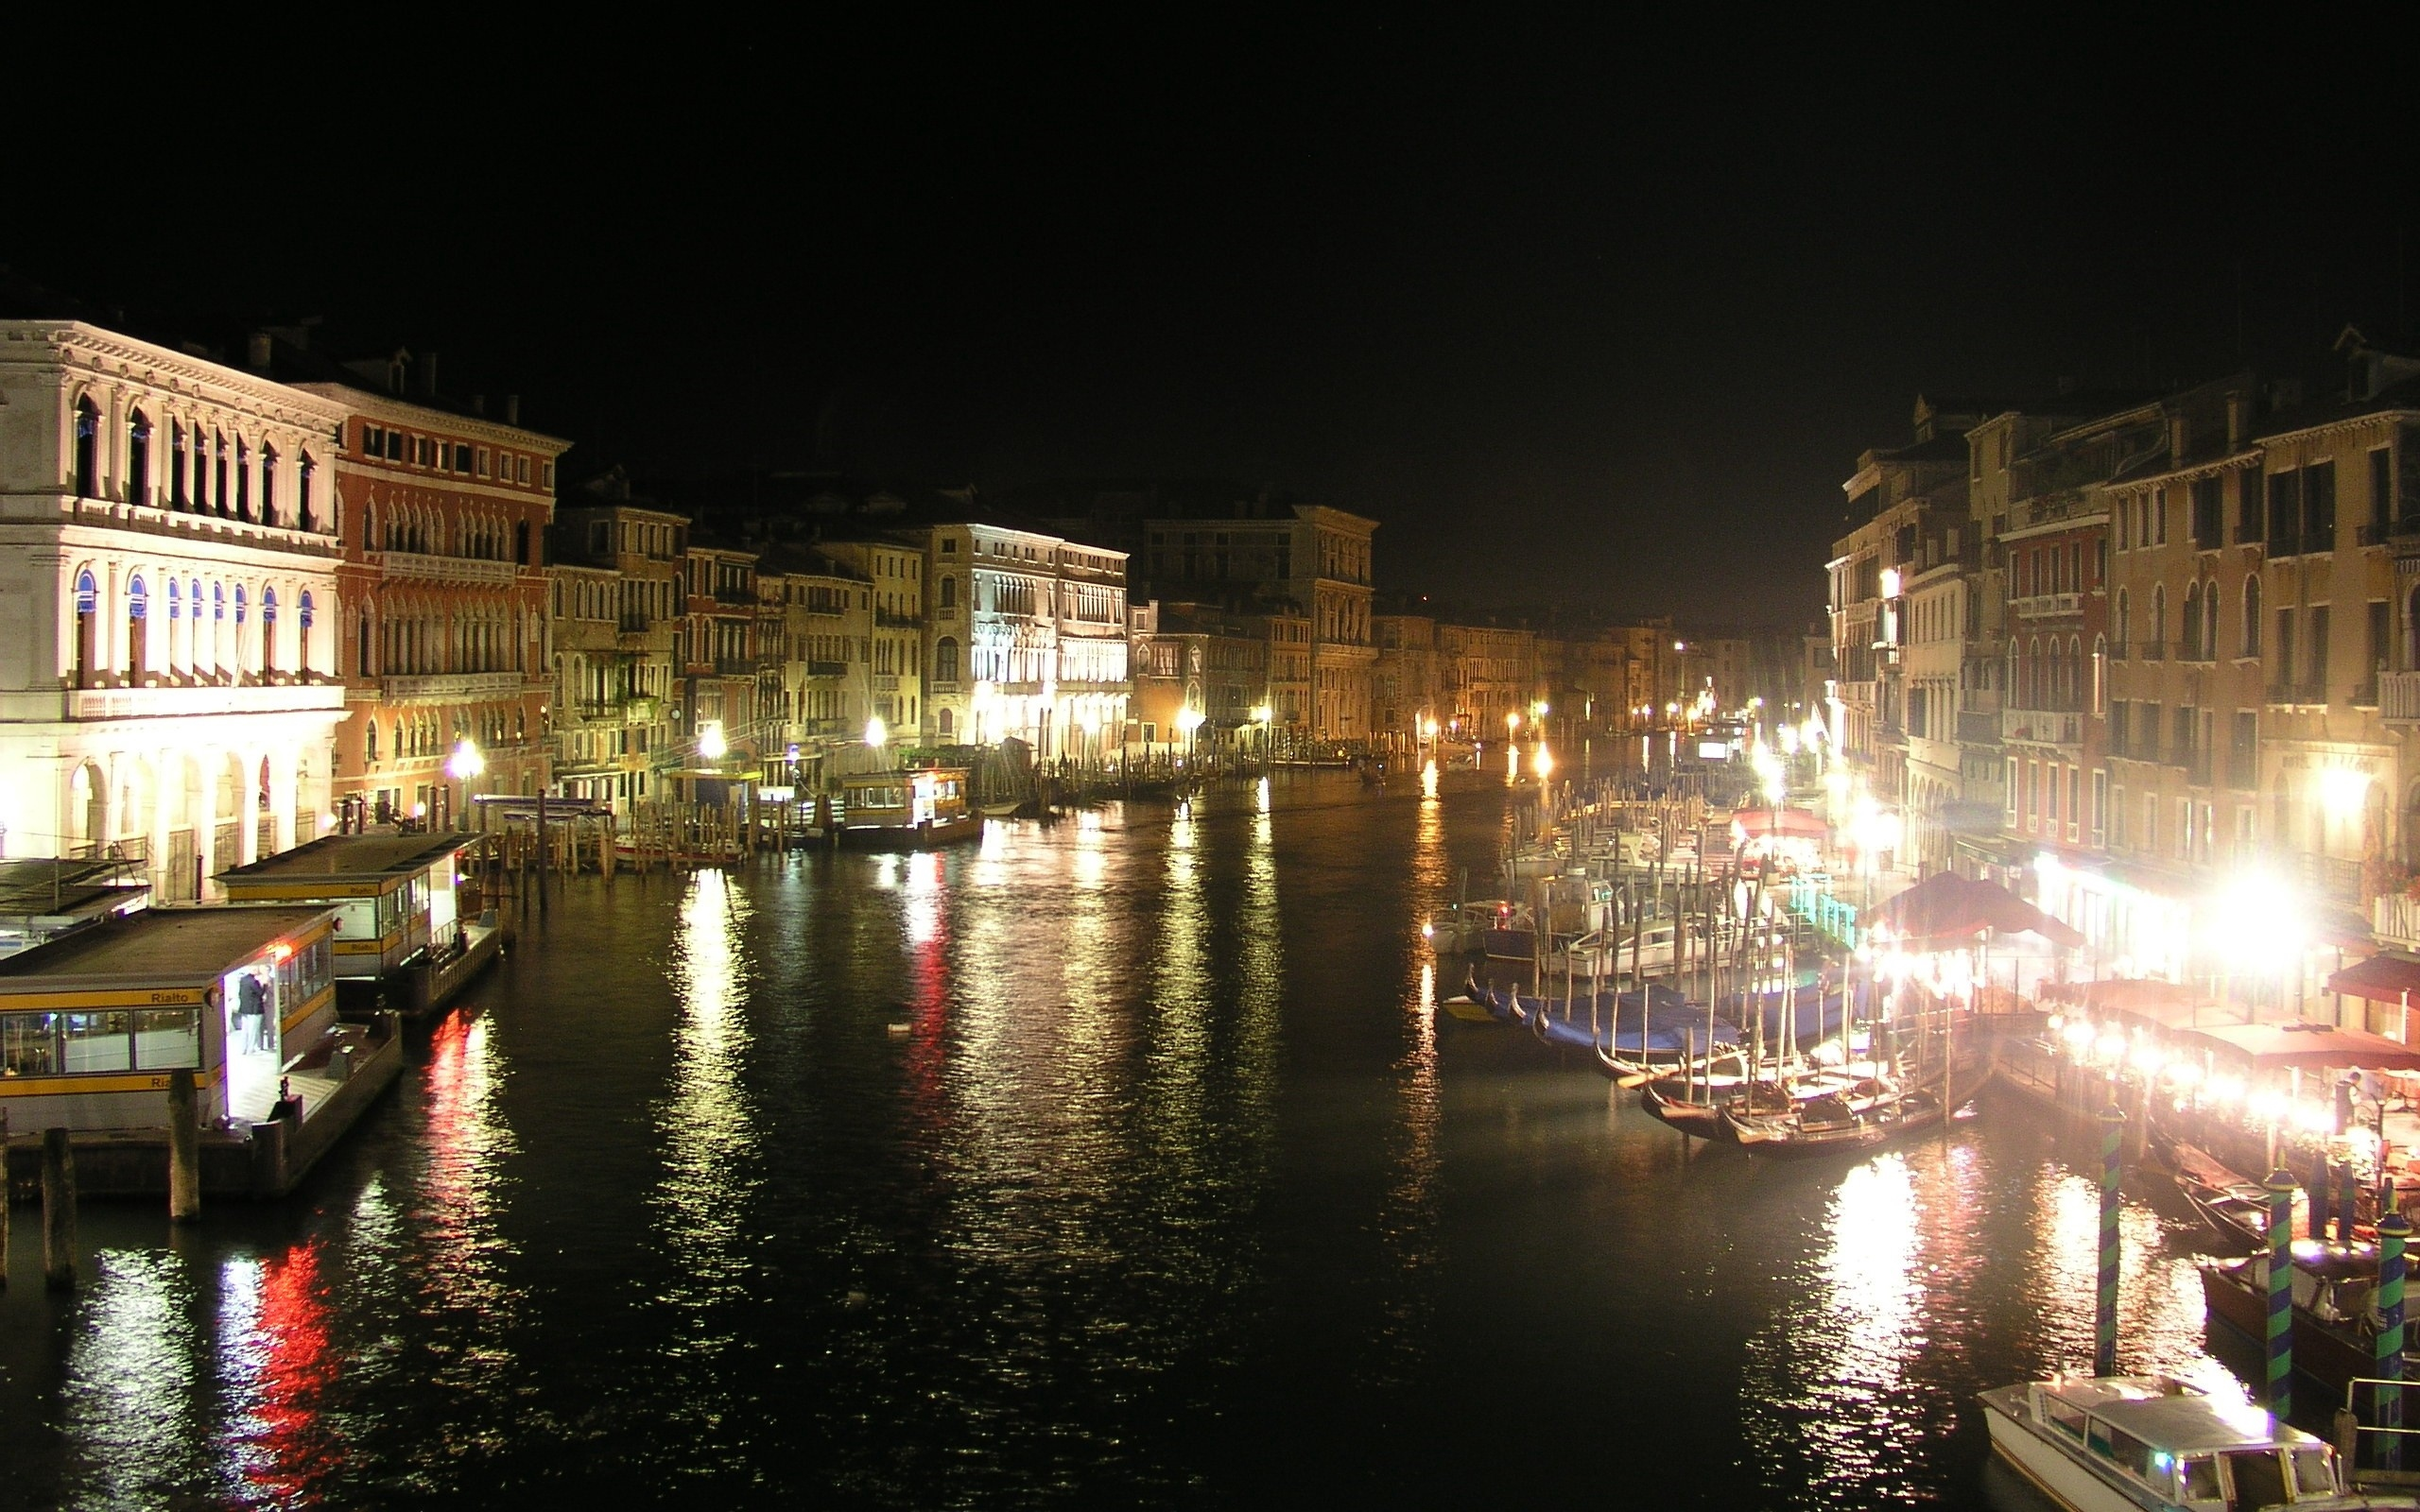 Venice Italy Night   Stock Photos Images HD Wallpaper HD 2560x1600